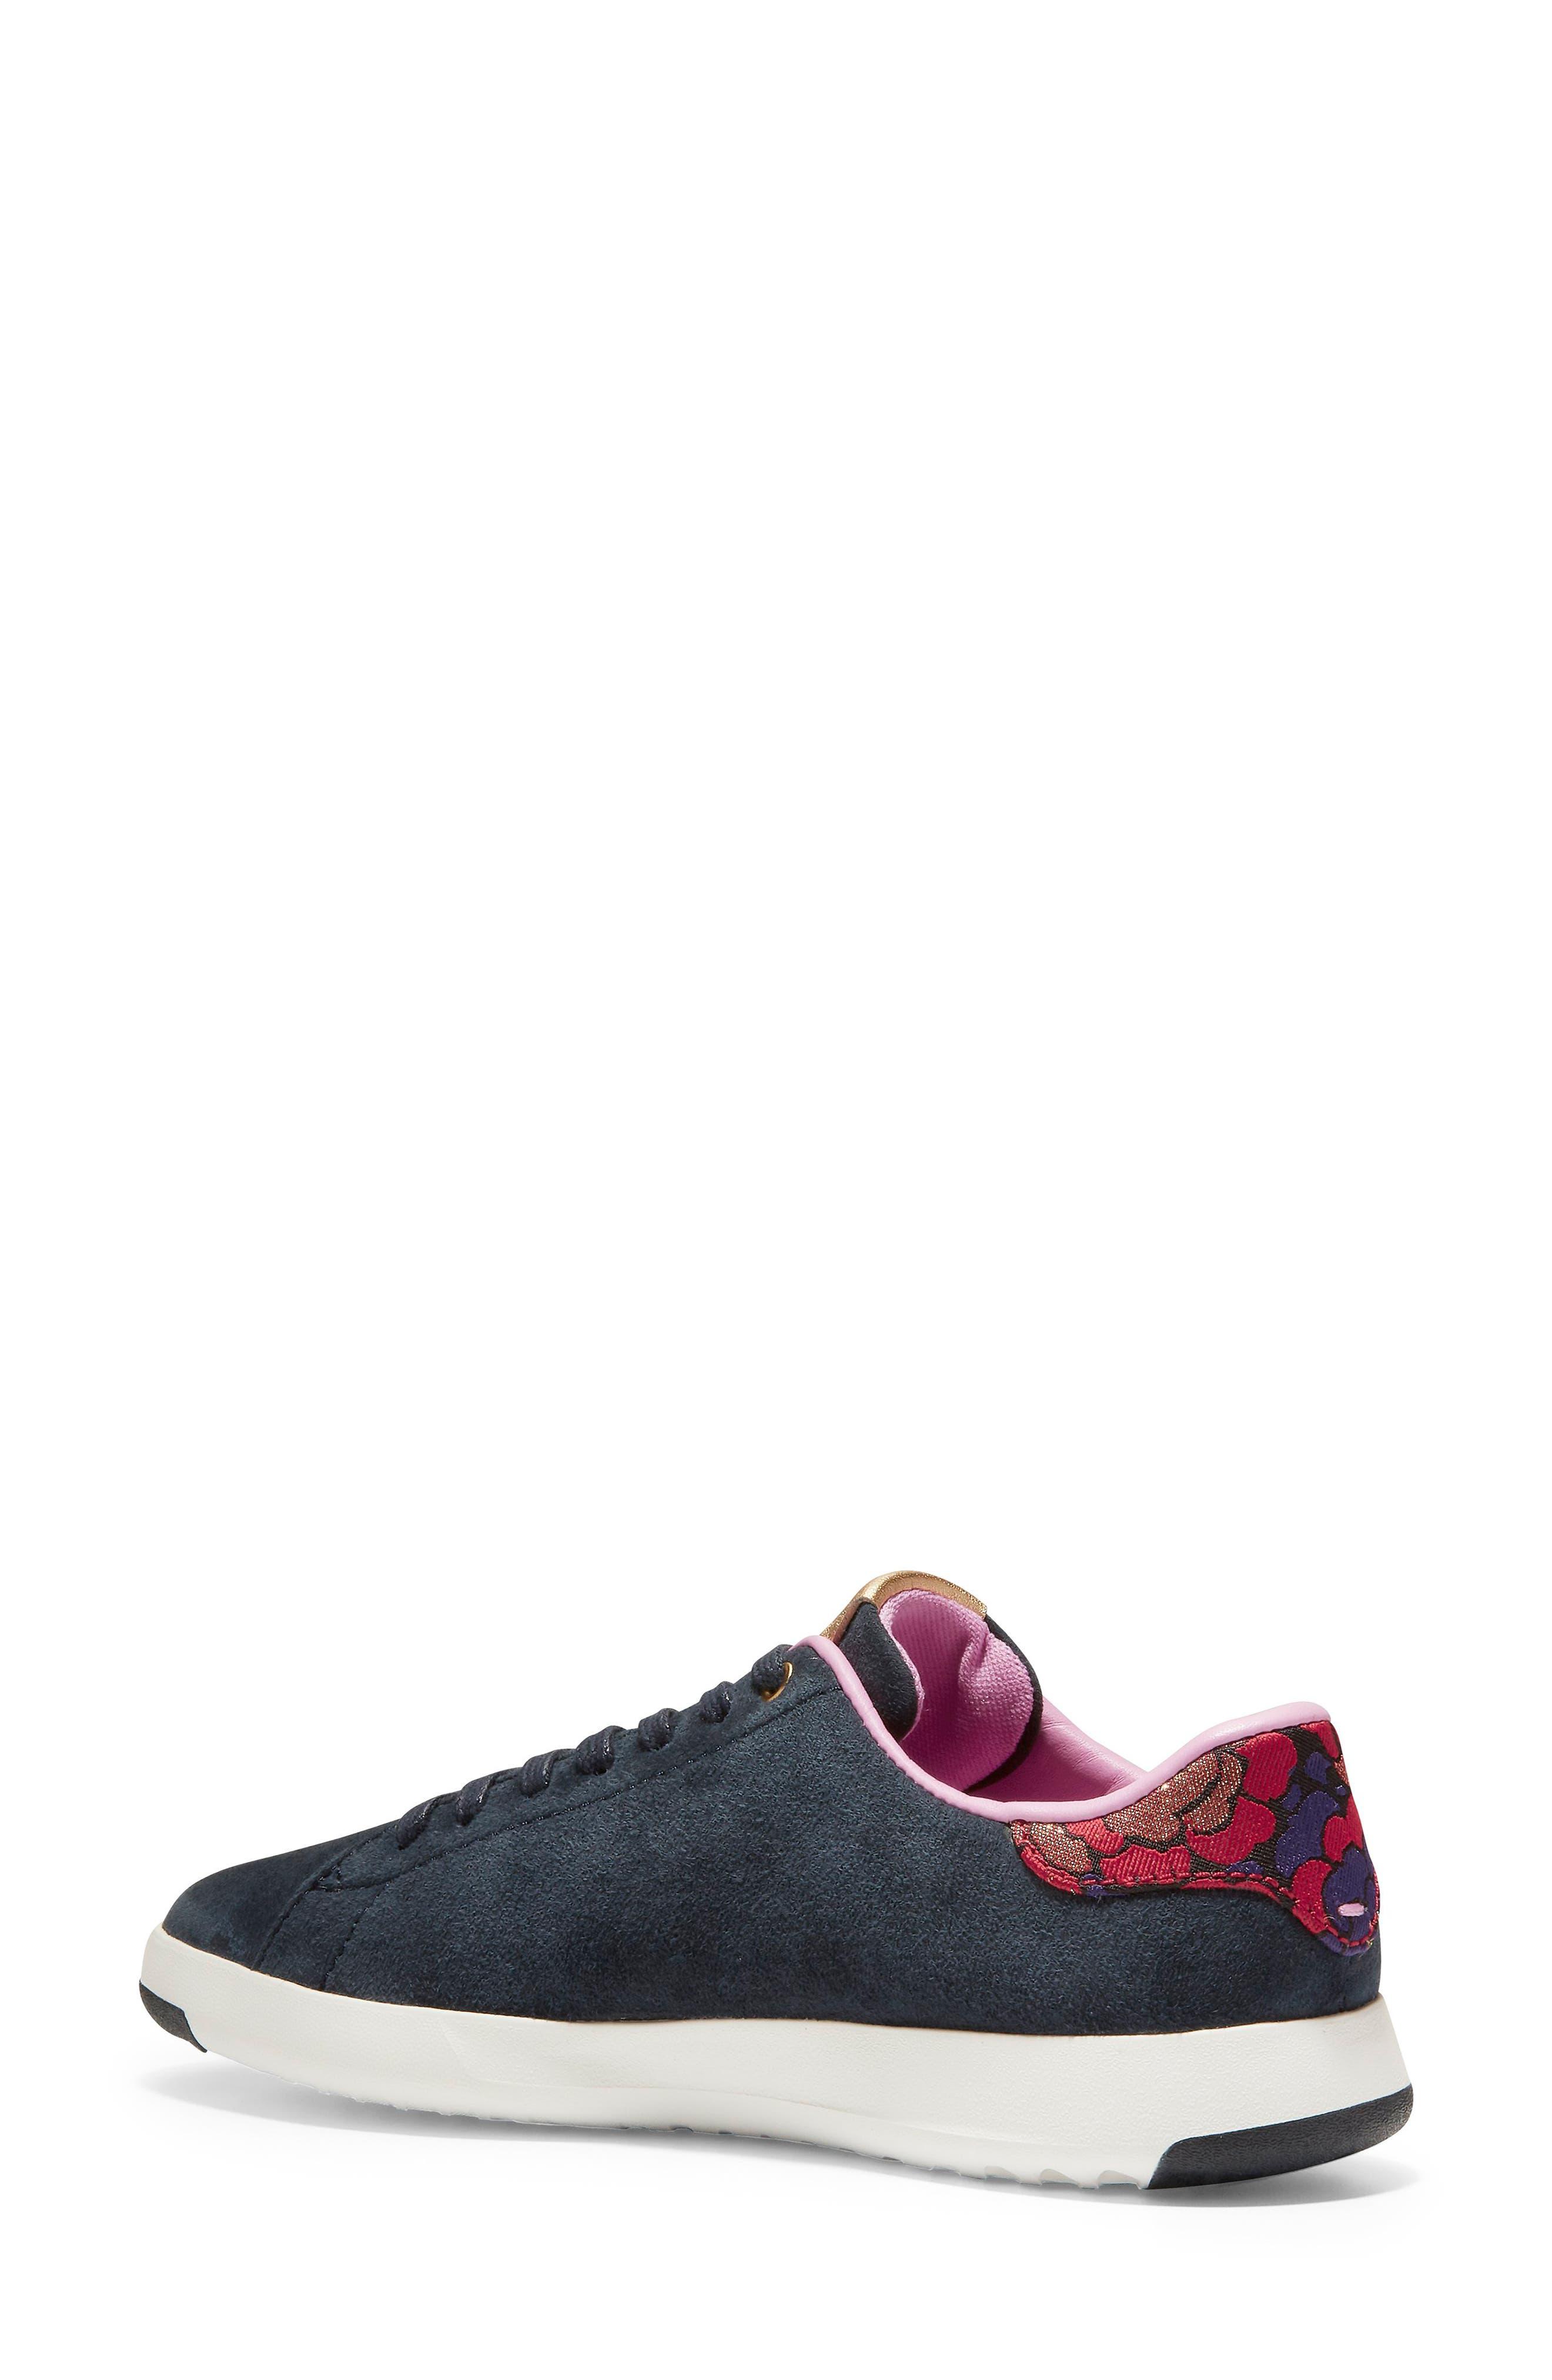 COLE HAAN, GrandPro Tennis Shoe, Alternate thumbnail 2, color, BLUEBERRY SUEDE